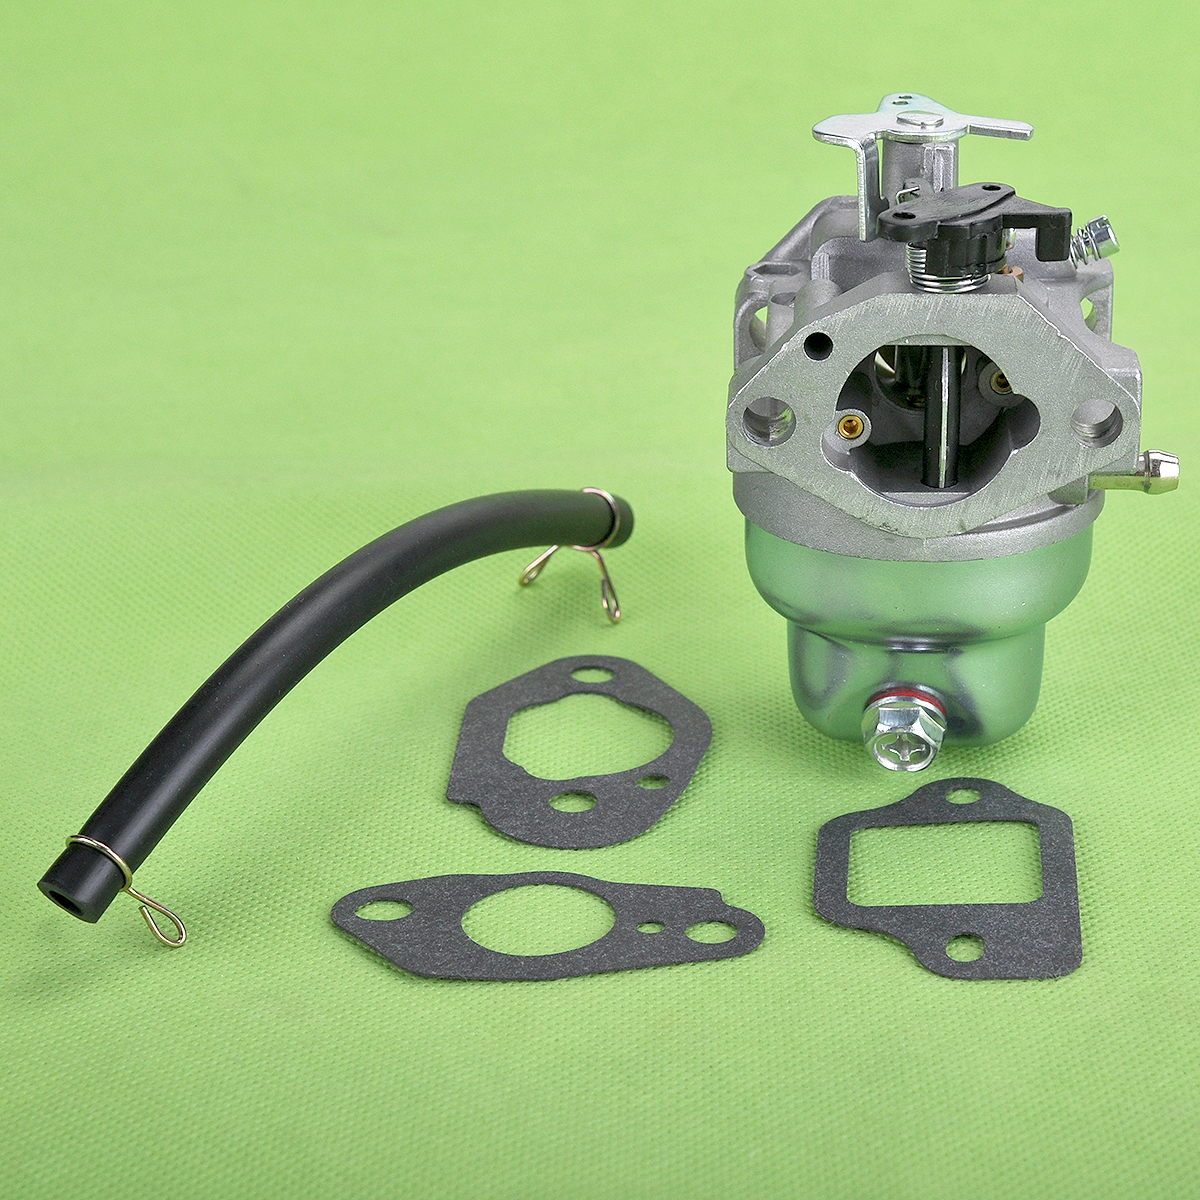 Carburetor gaskert for honda gcv160 hrb216 hrt216 16100 z0l 853 16100 z0l 862 ebay - Honda gcv 160 ...